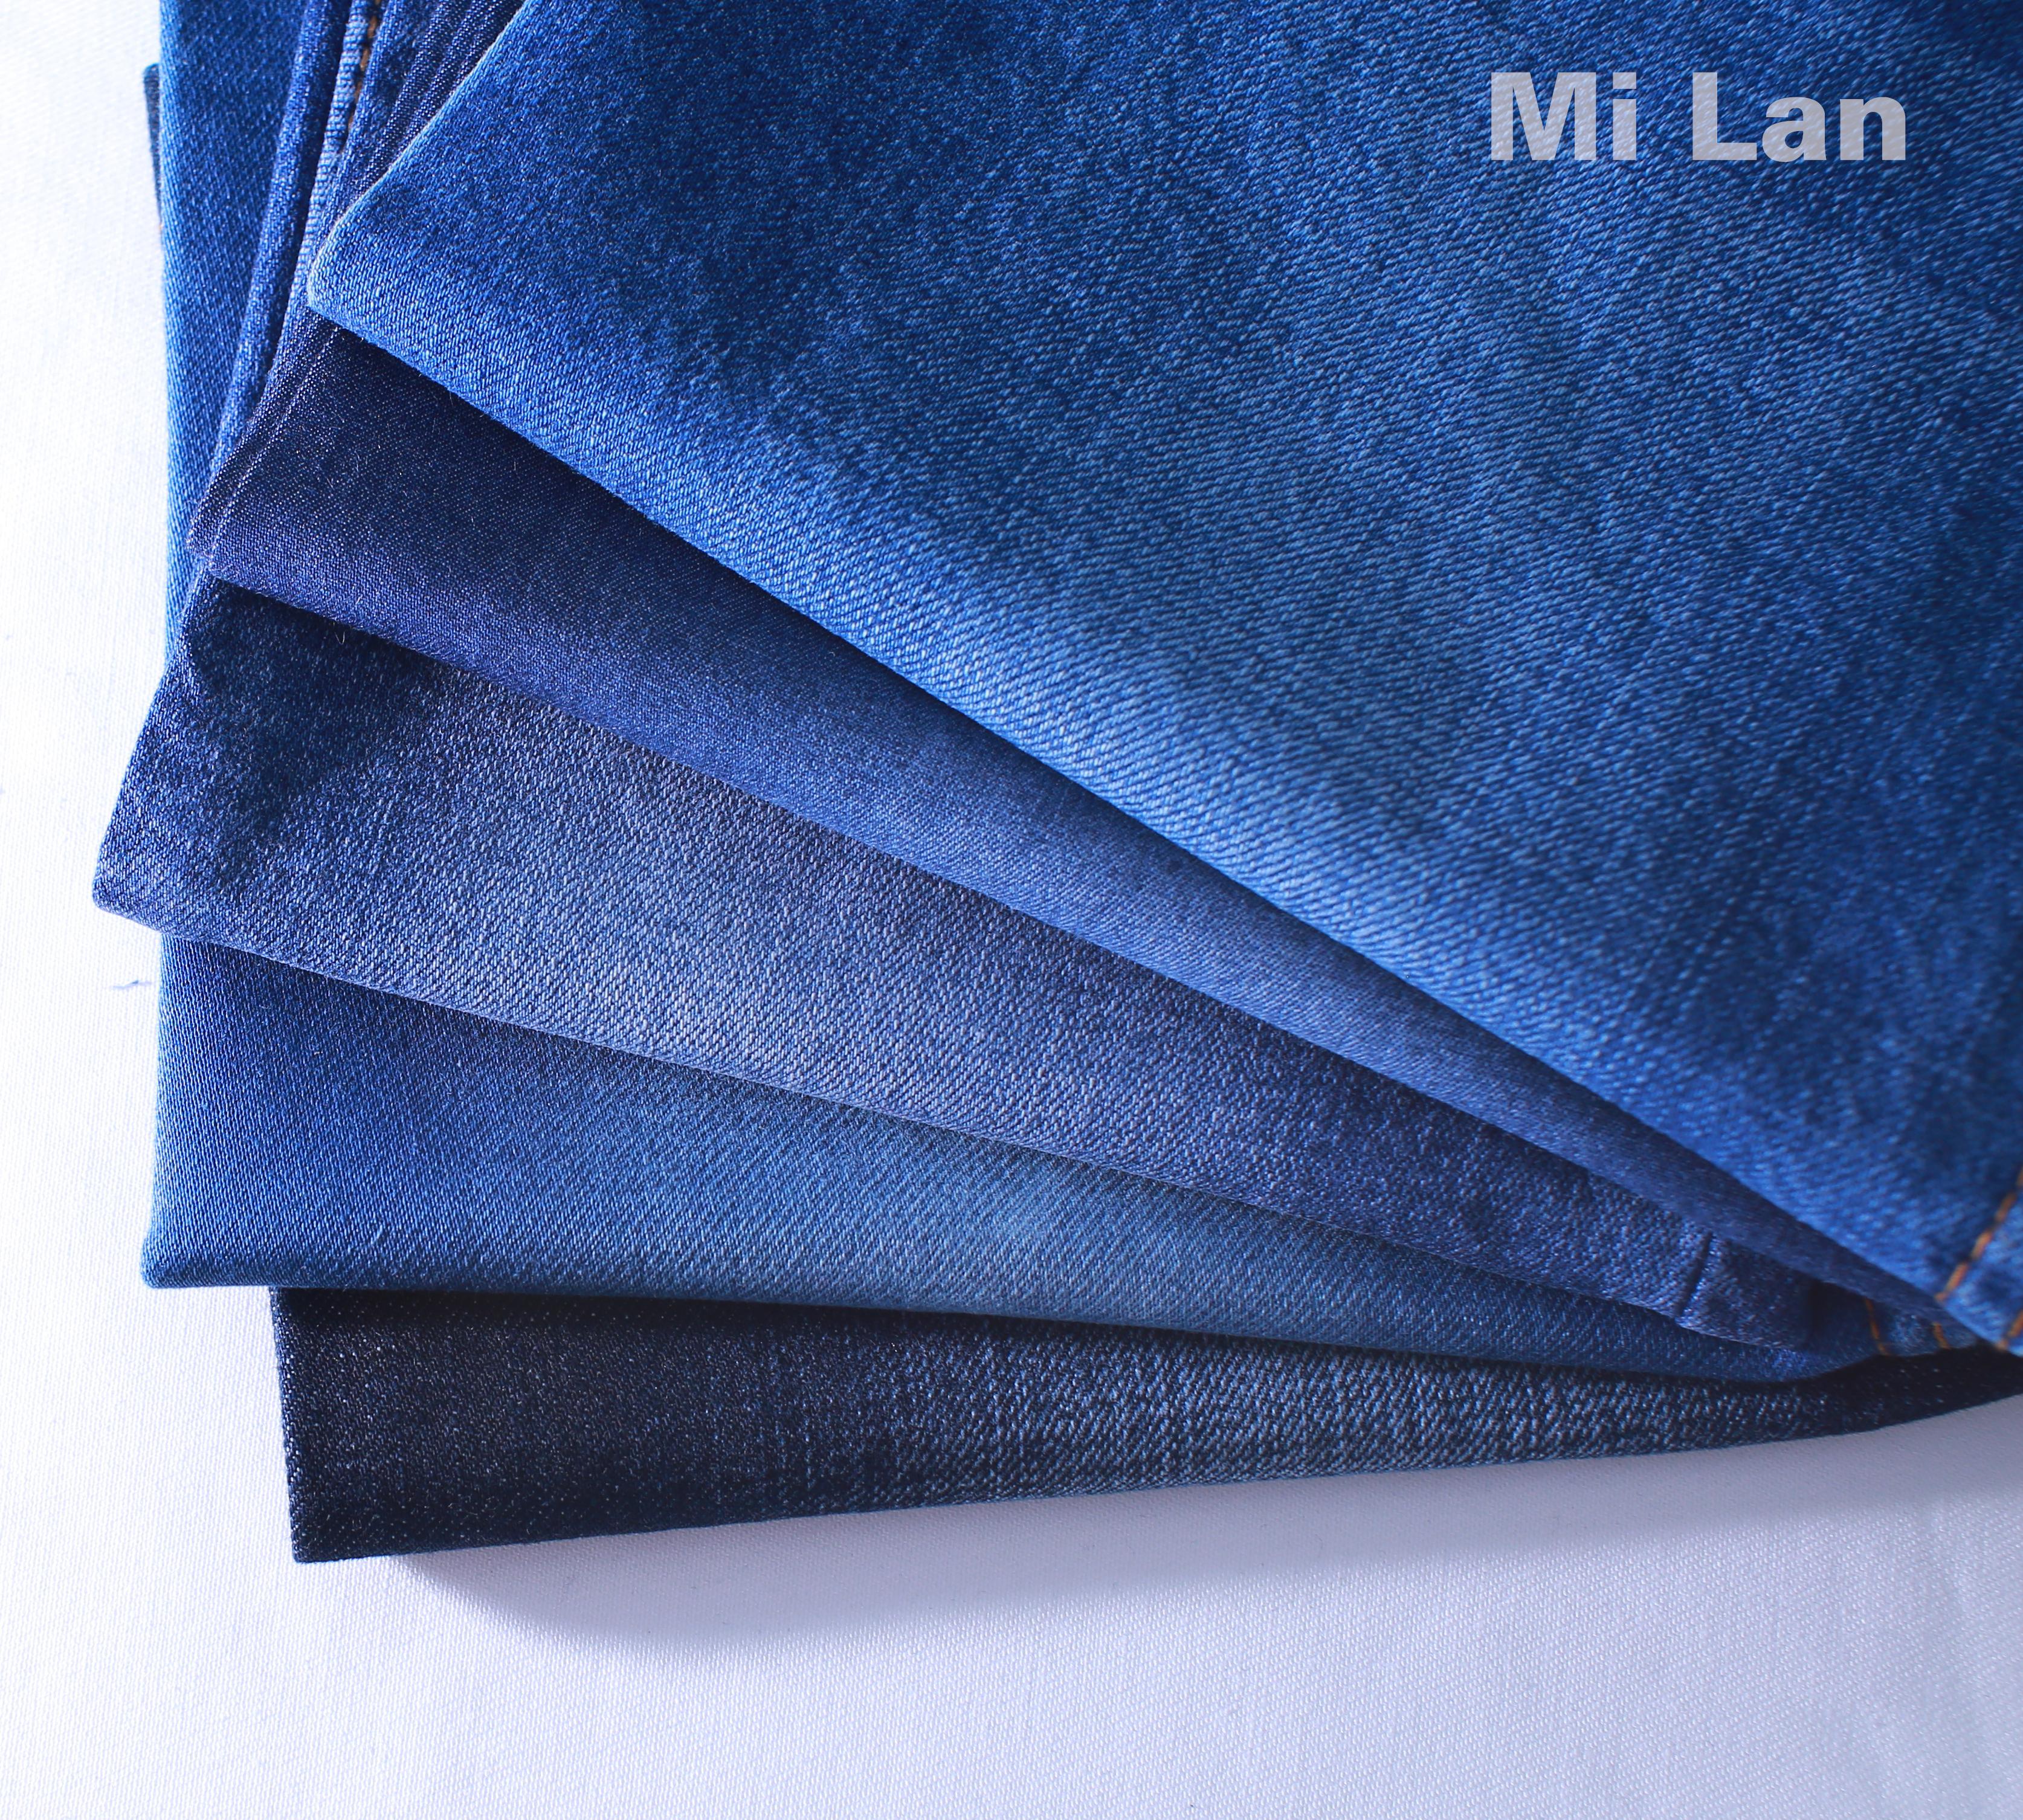 Vải Jean giặt sẵn